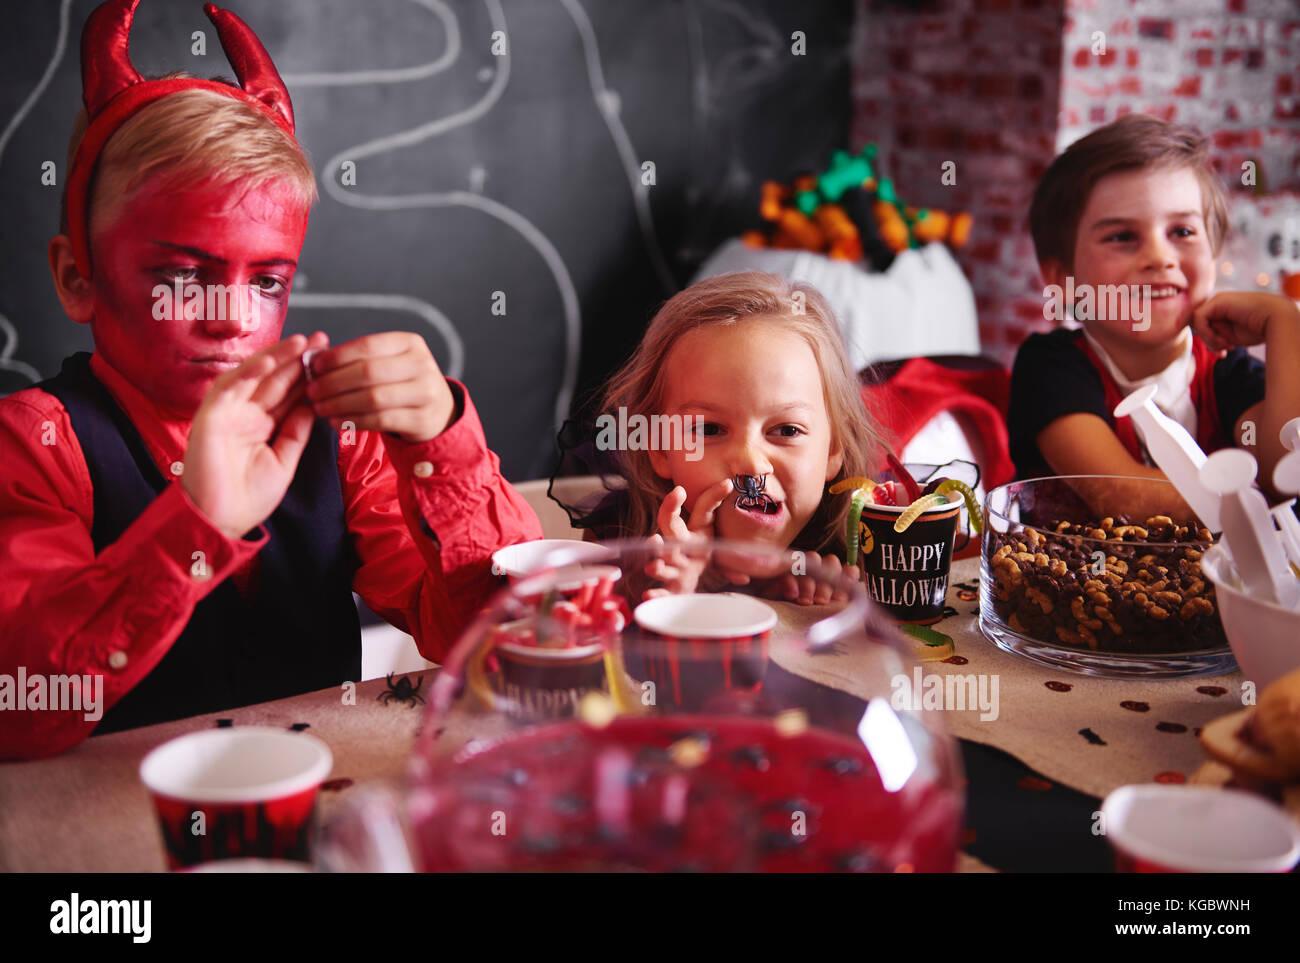 Absurde tout en mangeant à Halloween party Photo Stock